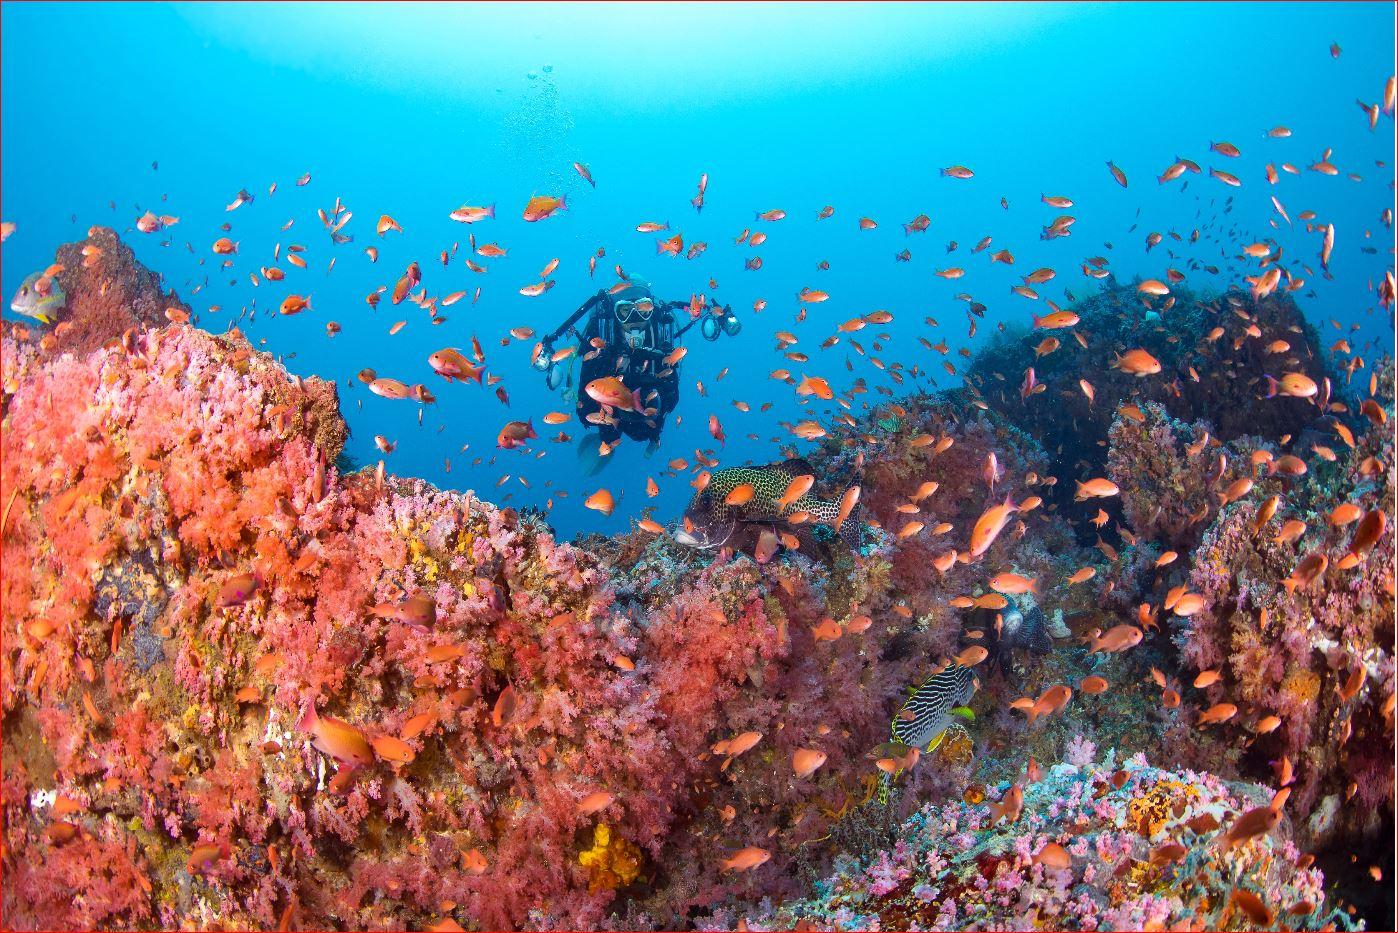 Puerto Galera's marine life